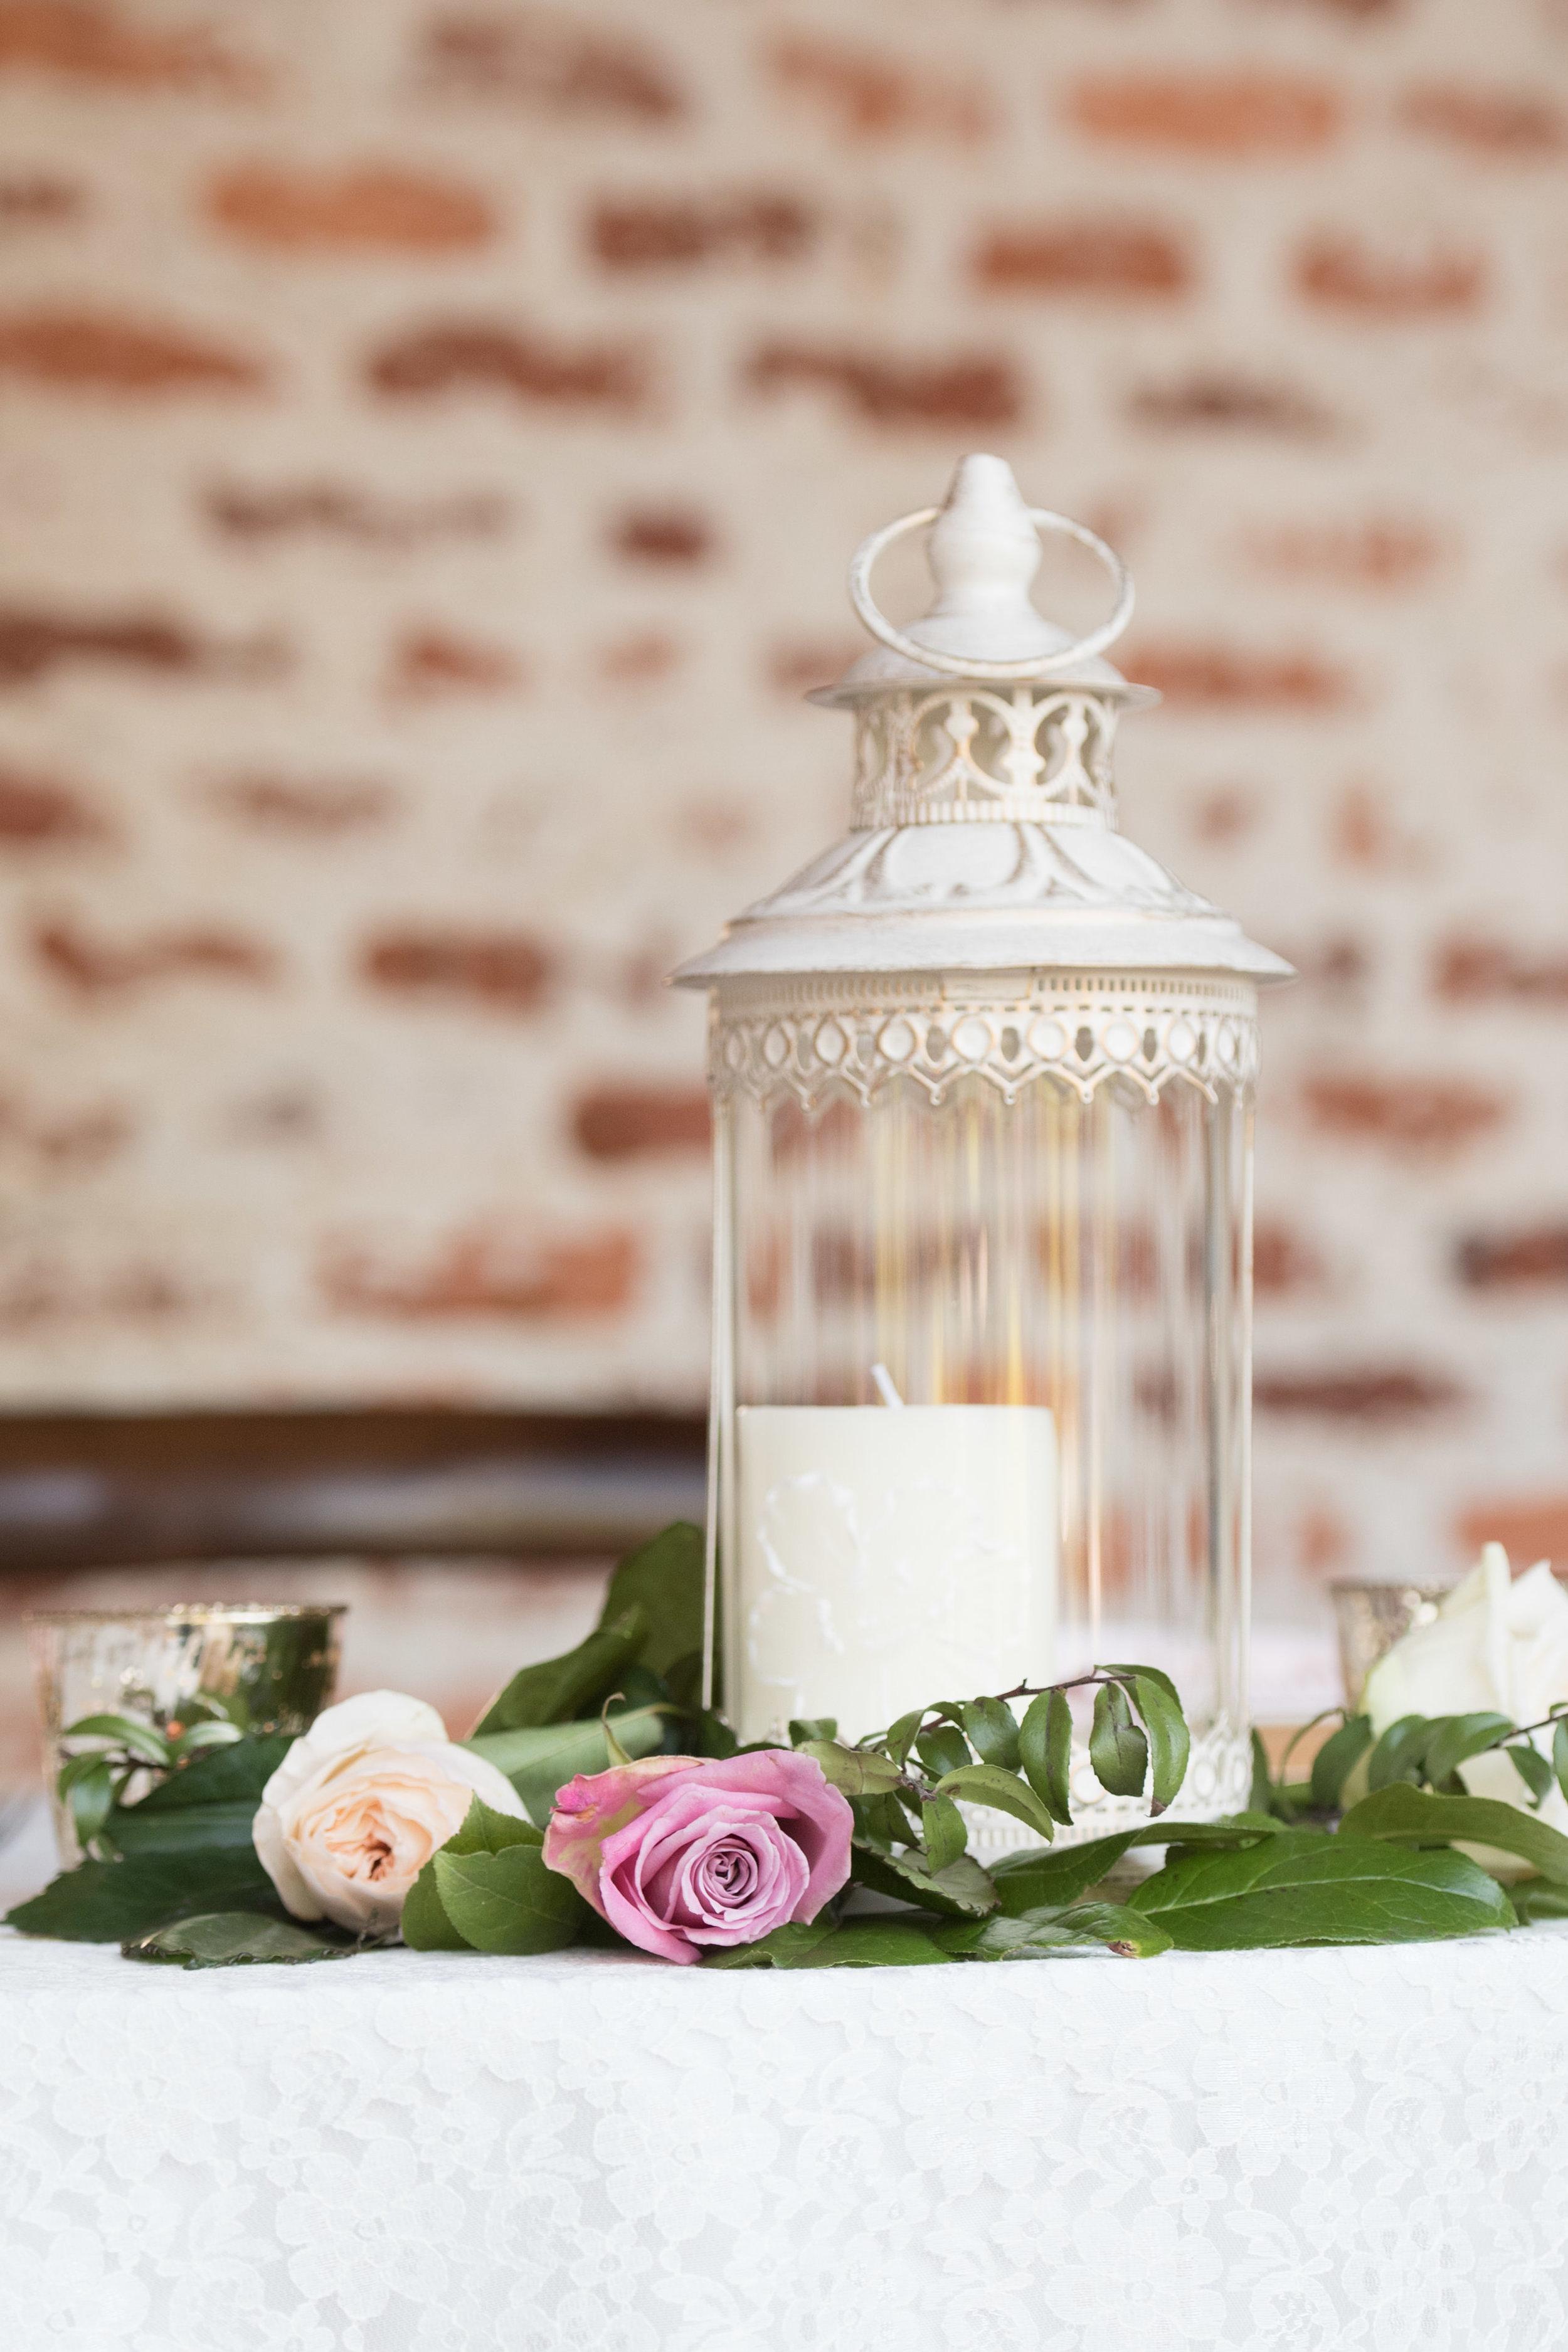 Gorgeous French Countryside Wedding Decor - Blush and White Wedding - Los Feliz Wedding